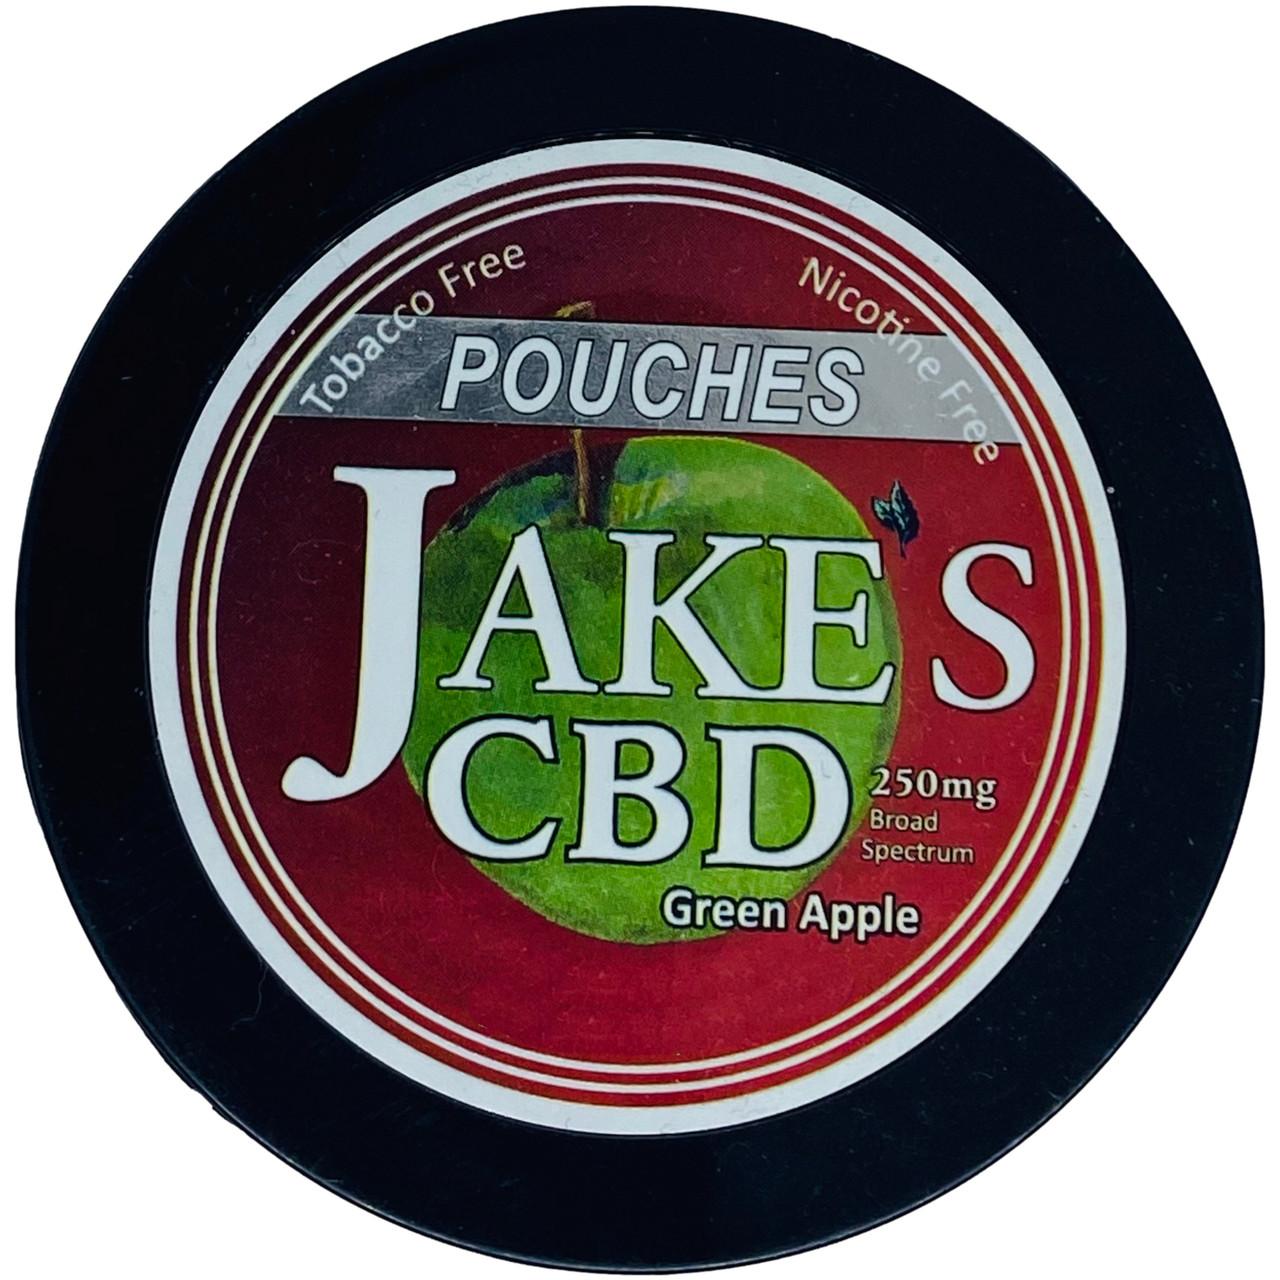 Jake's Mint Chew CBD Pouches Green Apple 1 Can